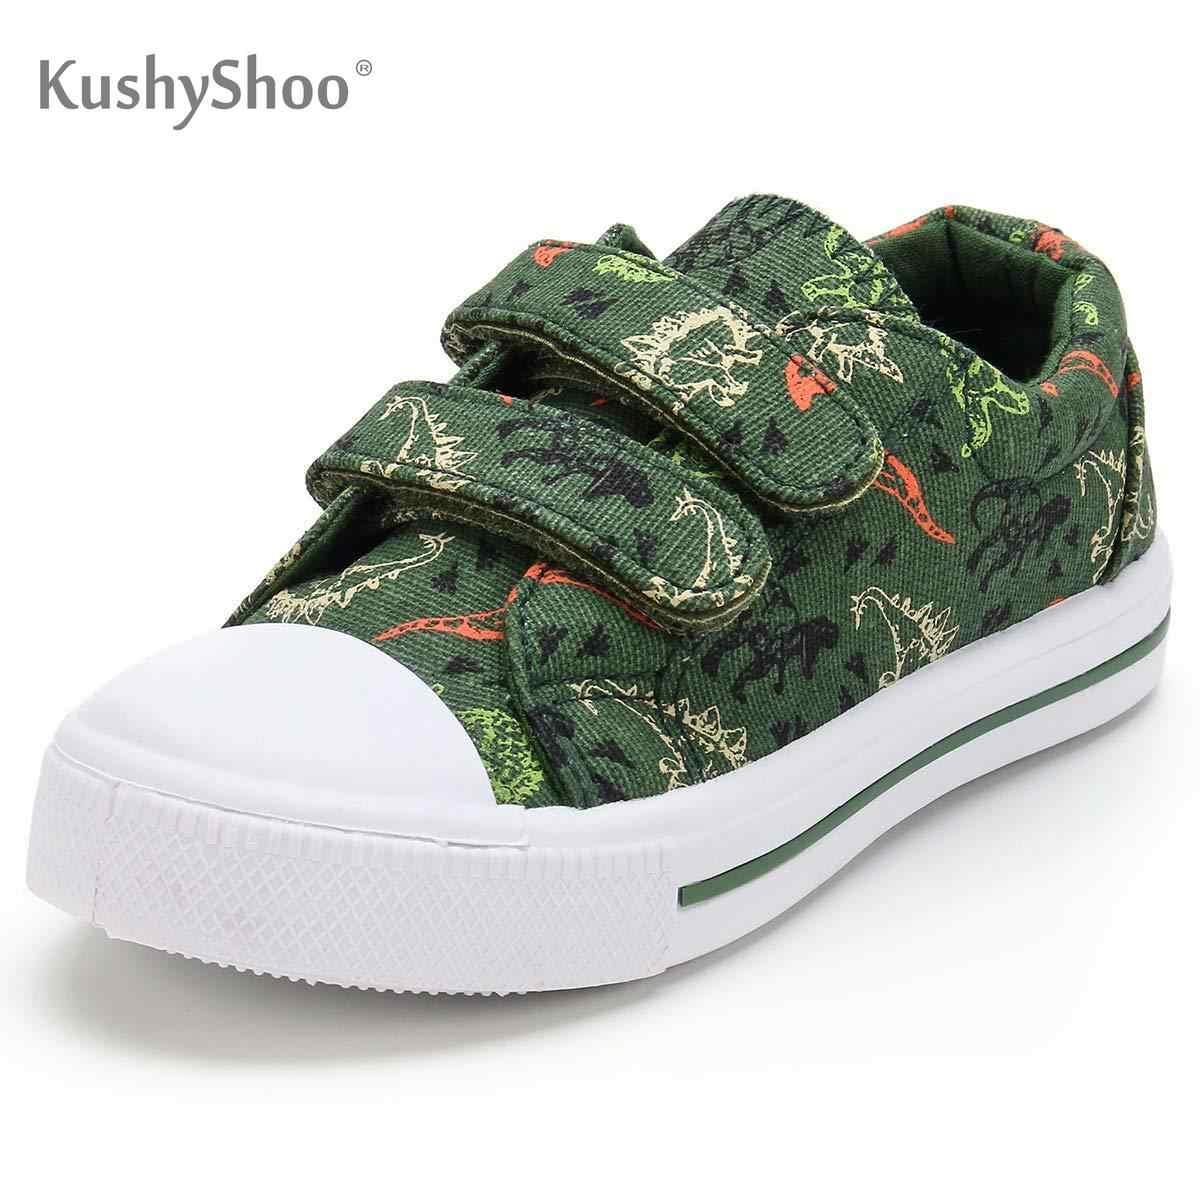 KushyShoo รองเท้าเด็กการ์ตูนไดโนเสาร์พิมพ์ Dual Hook & Loop รองเท้าผ้าใบเด็กสาวเด็กวัยหัดเดินรองเท้าผ้าใบรองเท้า